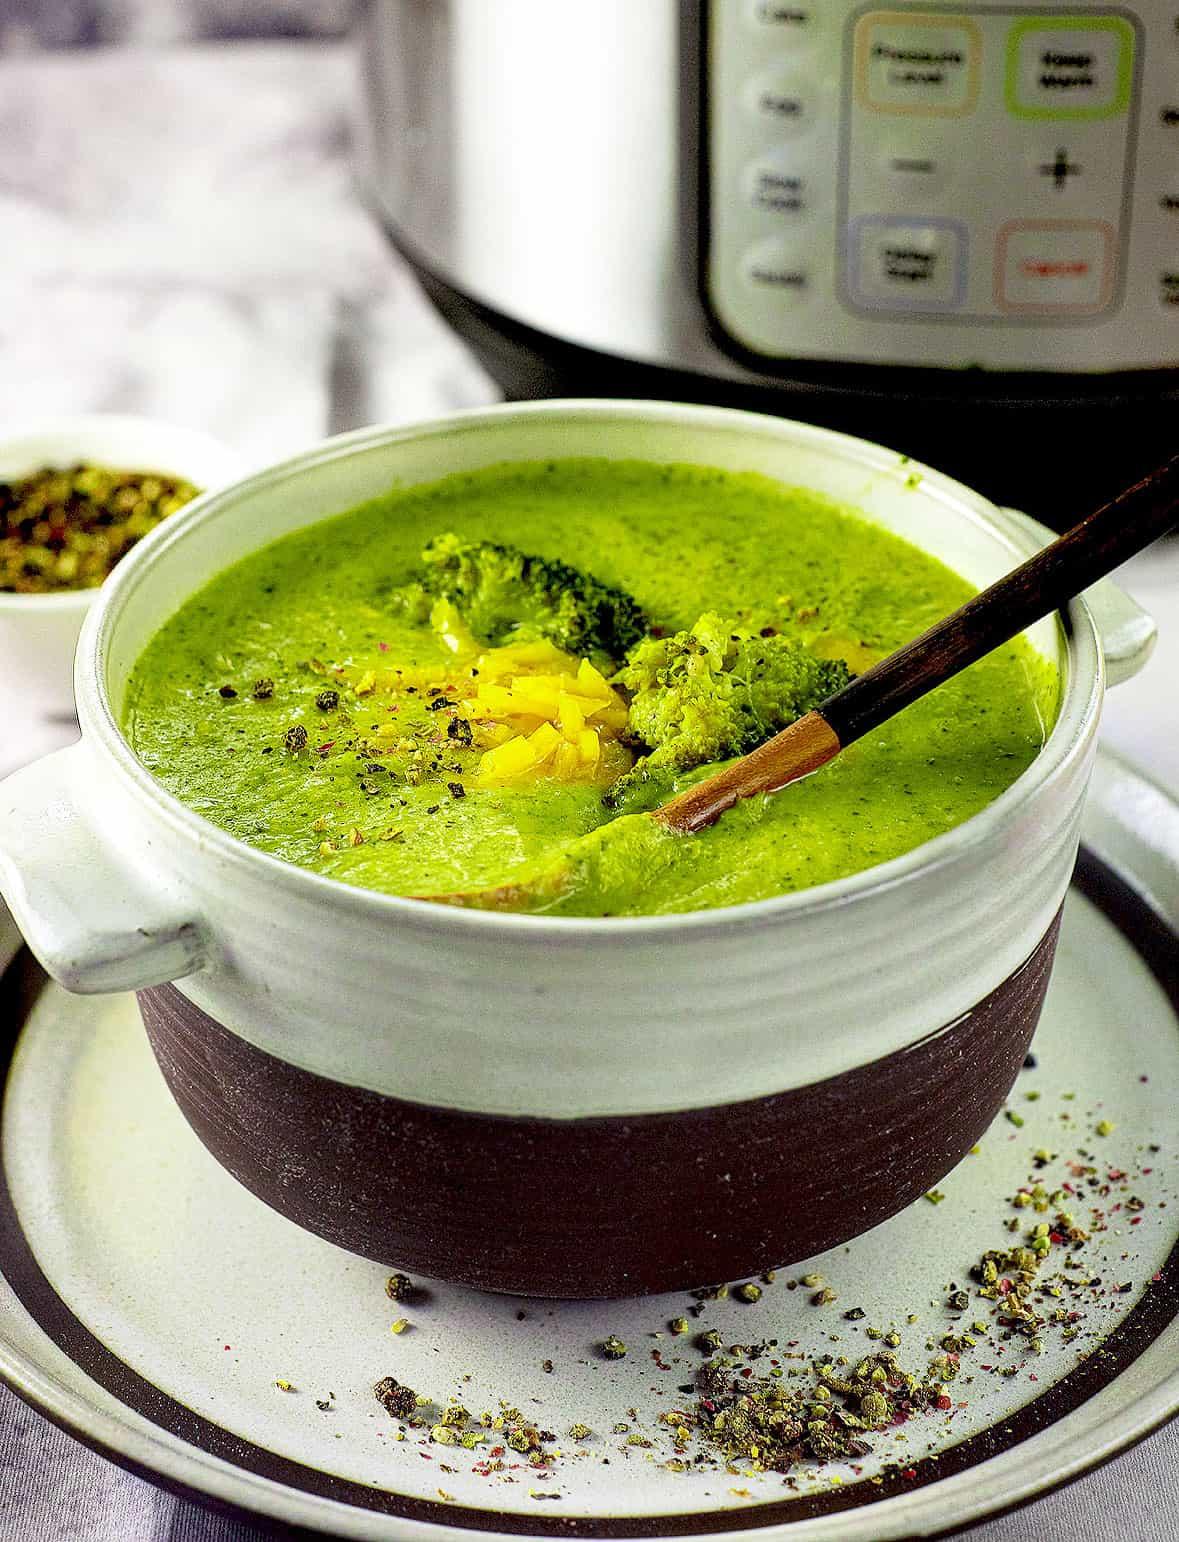 instant-pot-broccoli-cheddar-soup